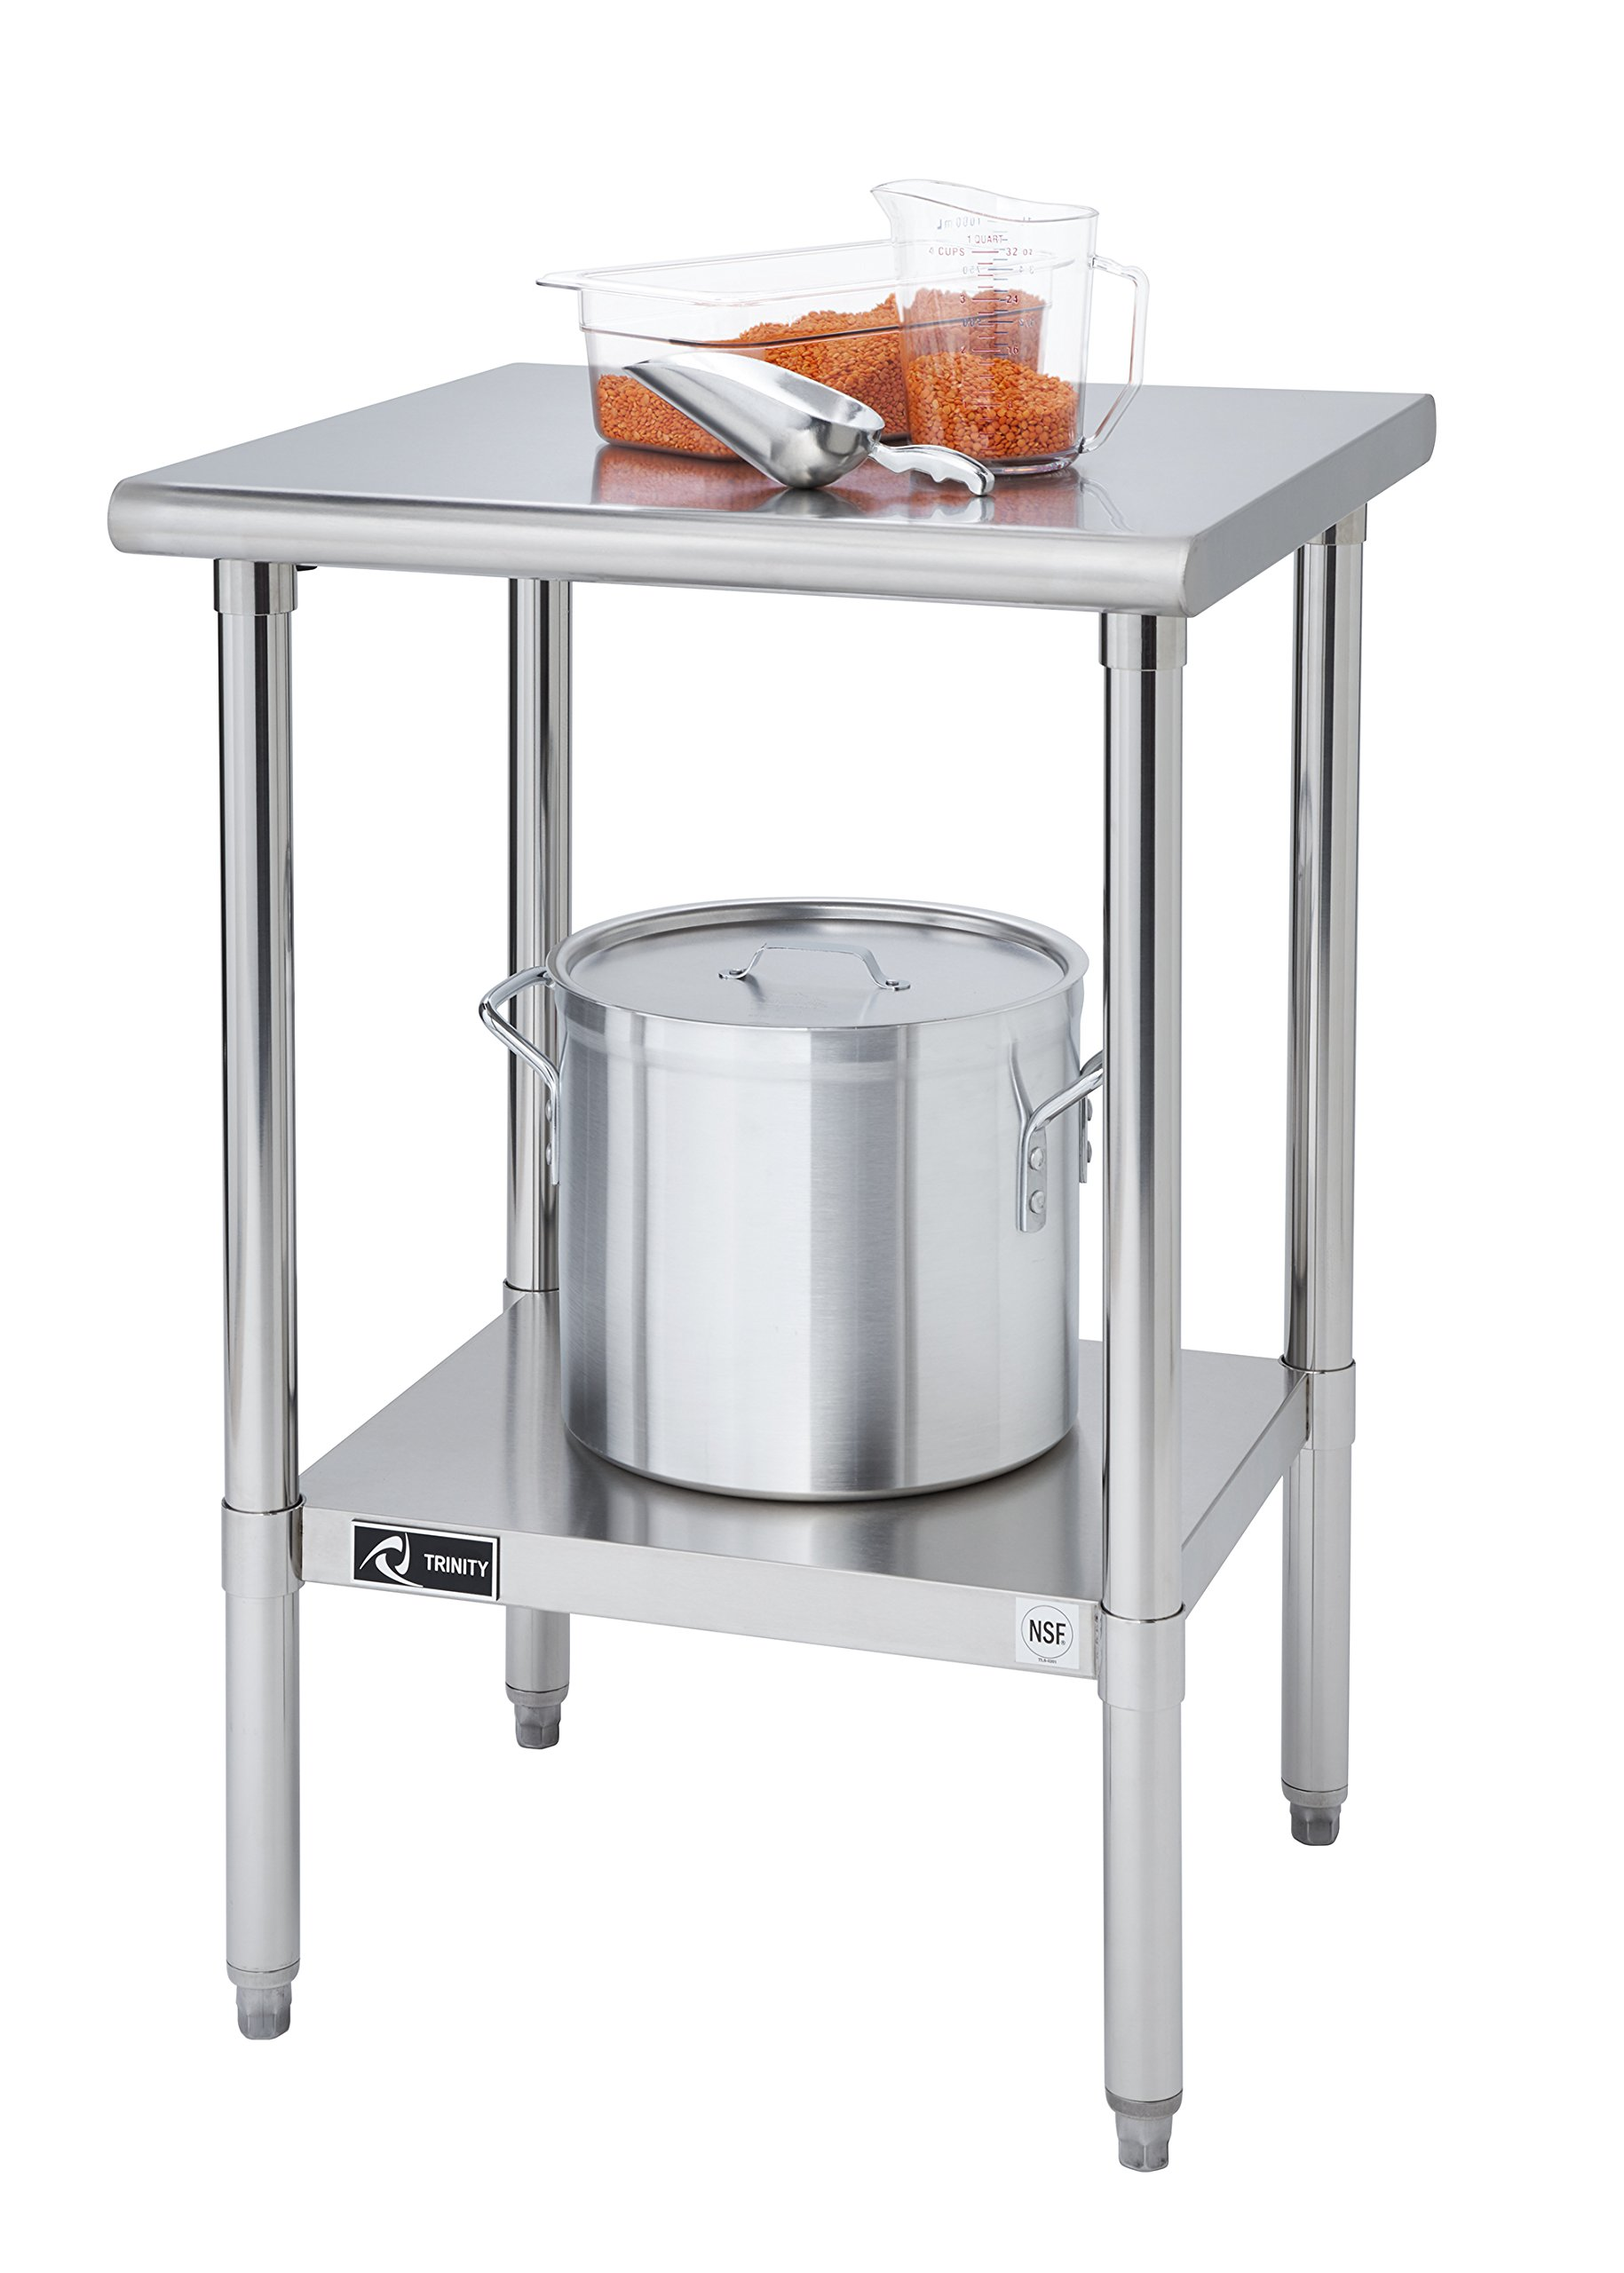 TRINITY EcoStorage NSF Stainless Steel Table, 24-Inch by Trinity (Image #5)